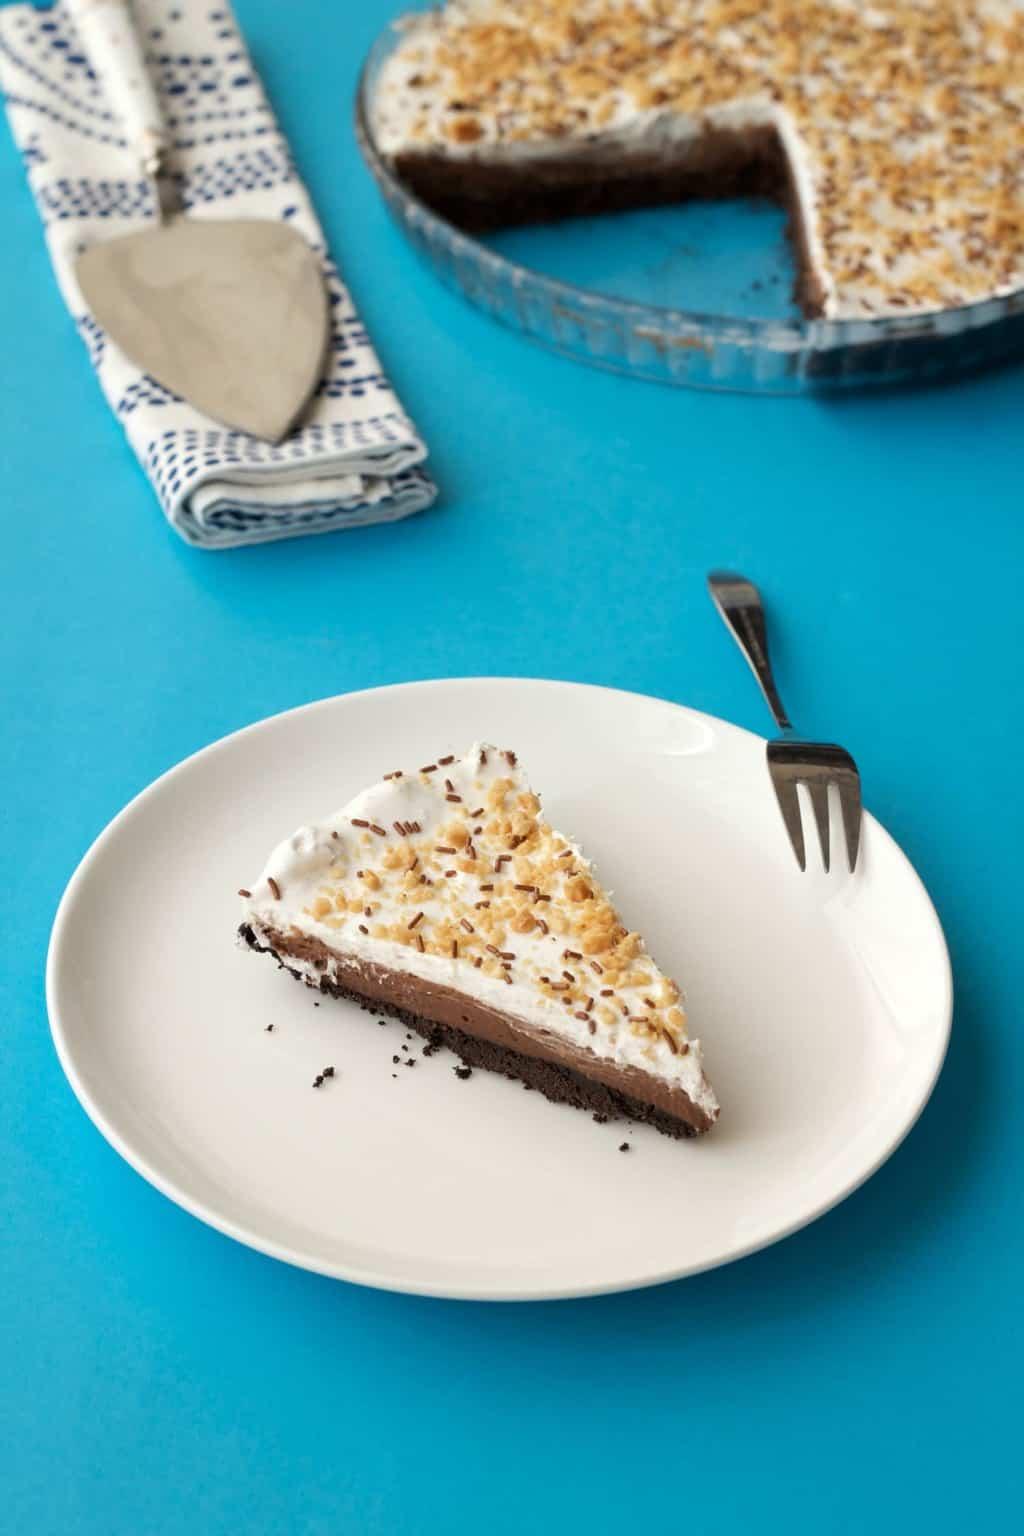 Vegan Chocolate Peanut Butter Oreo Pie #vegan #lovingitvegan #dessert #oreo #pie